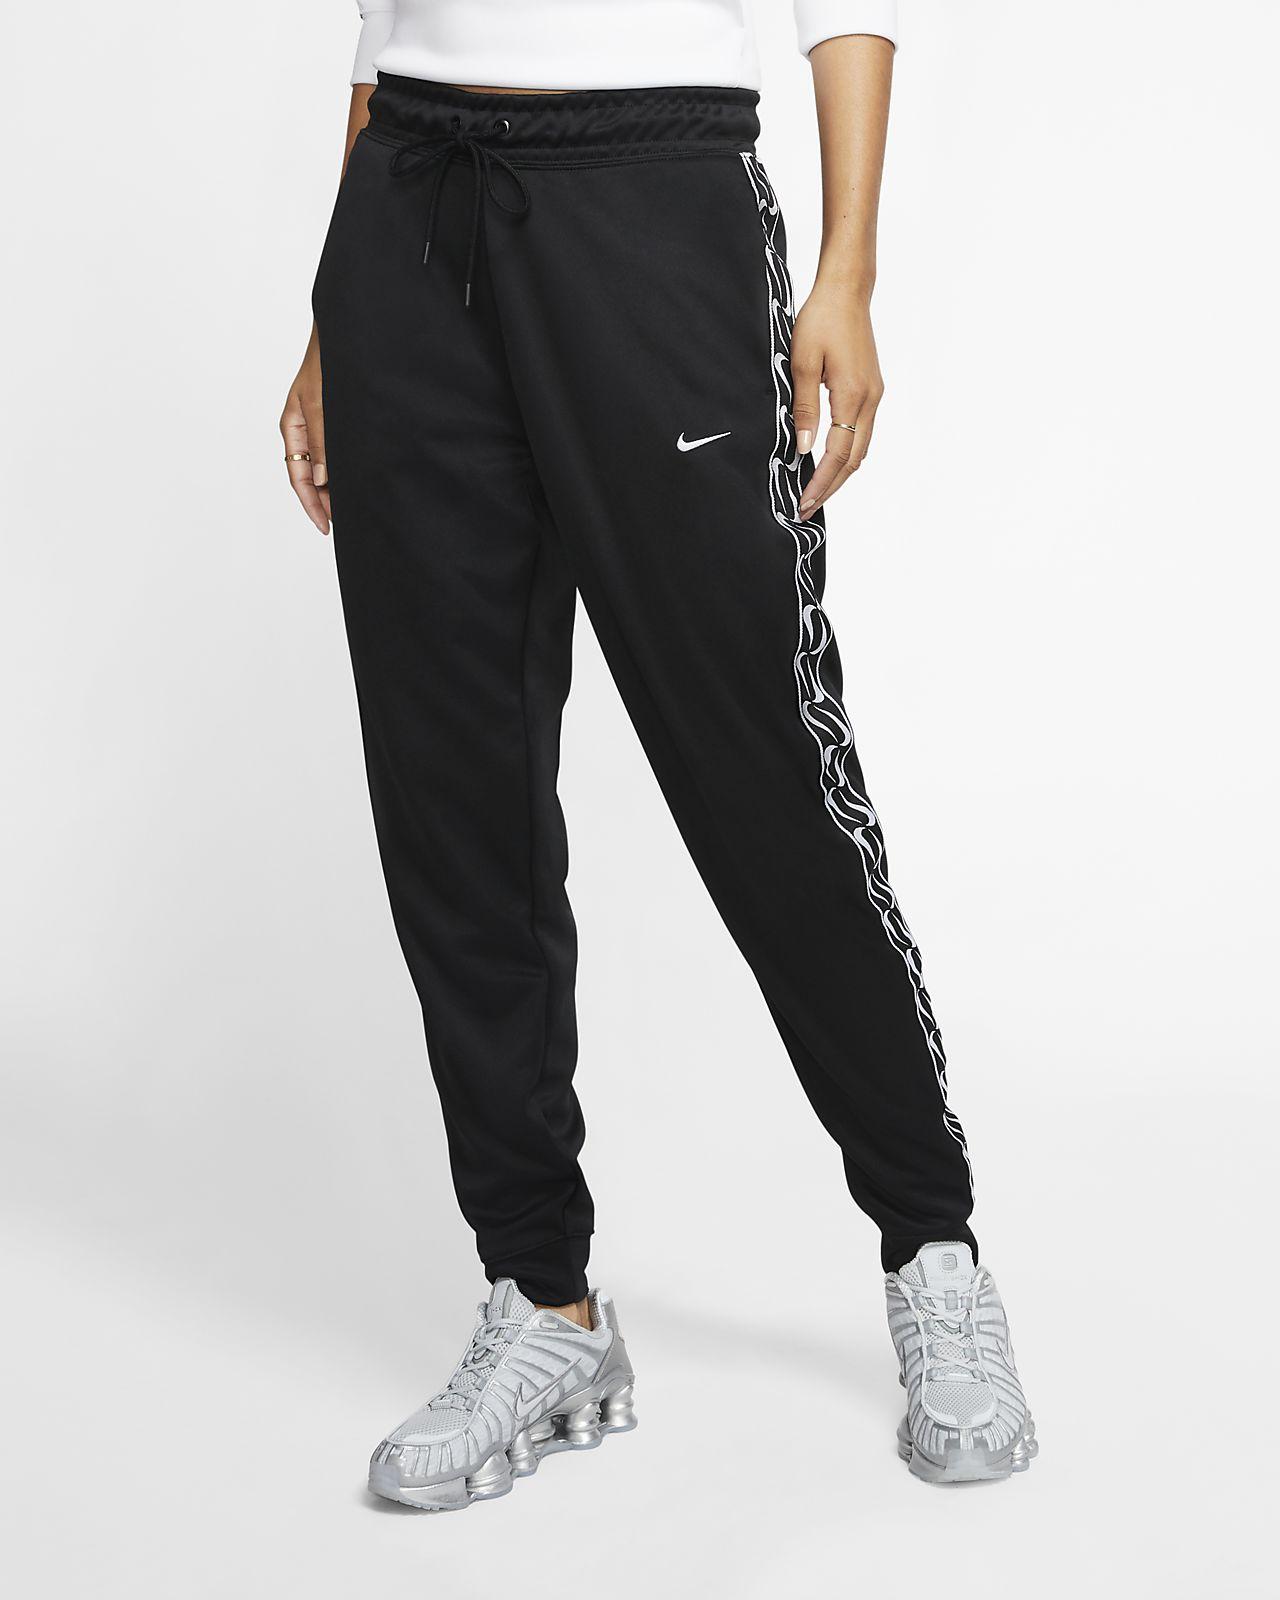 Nike Sportswear Damen-Jogger mit Logo